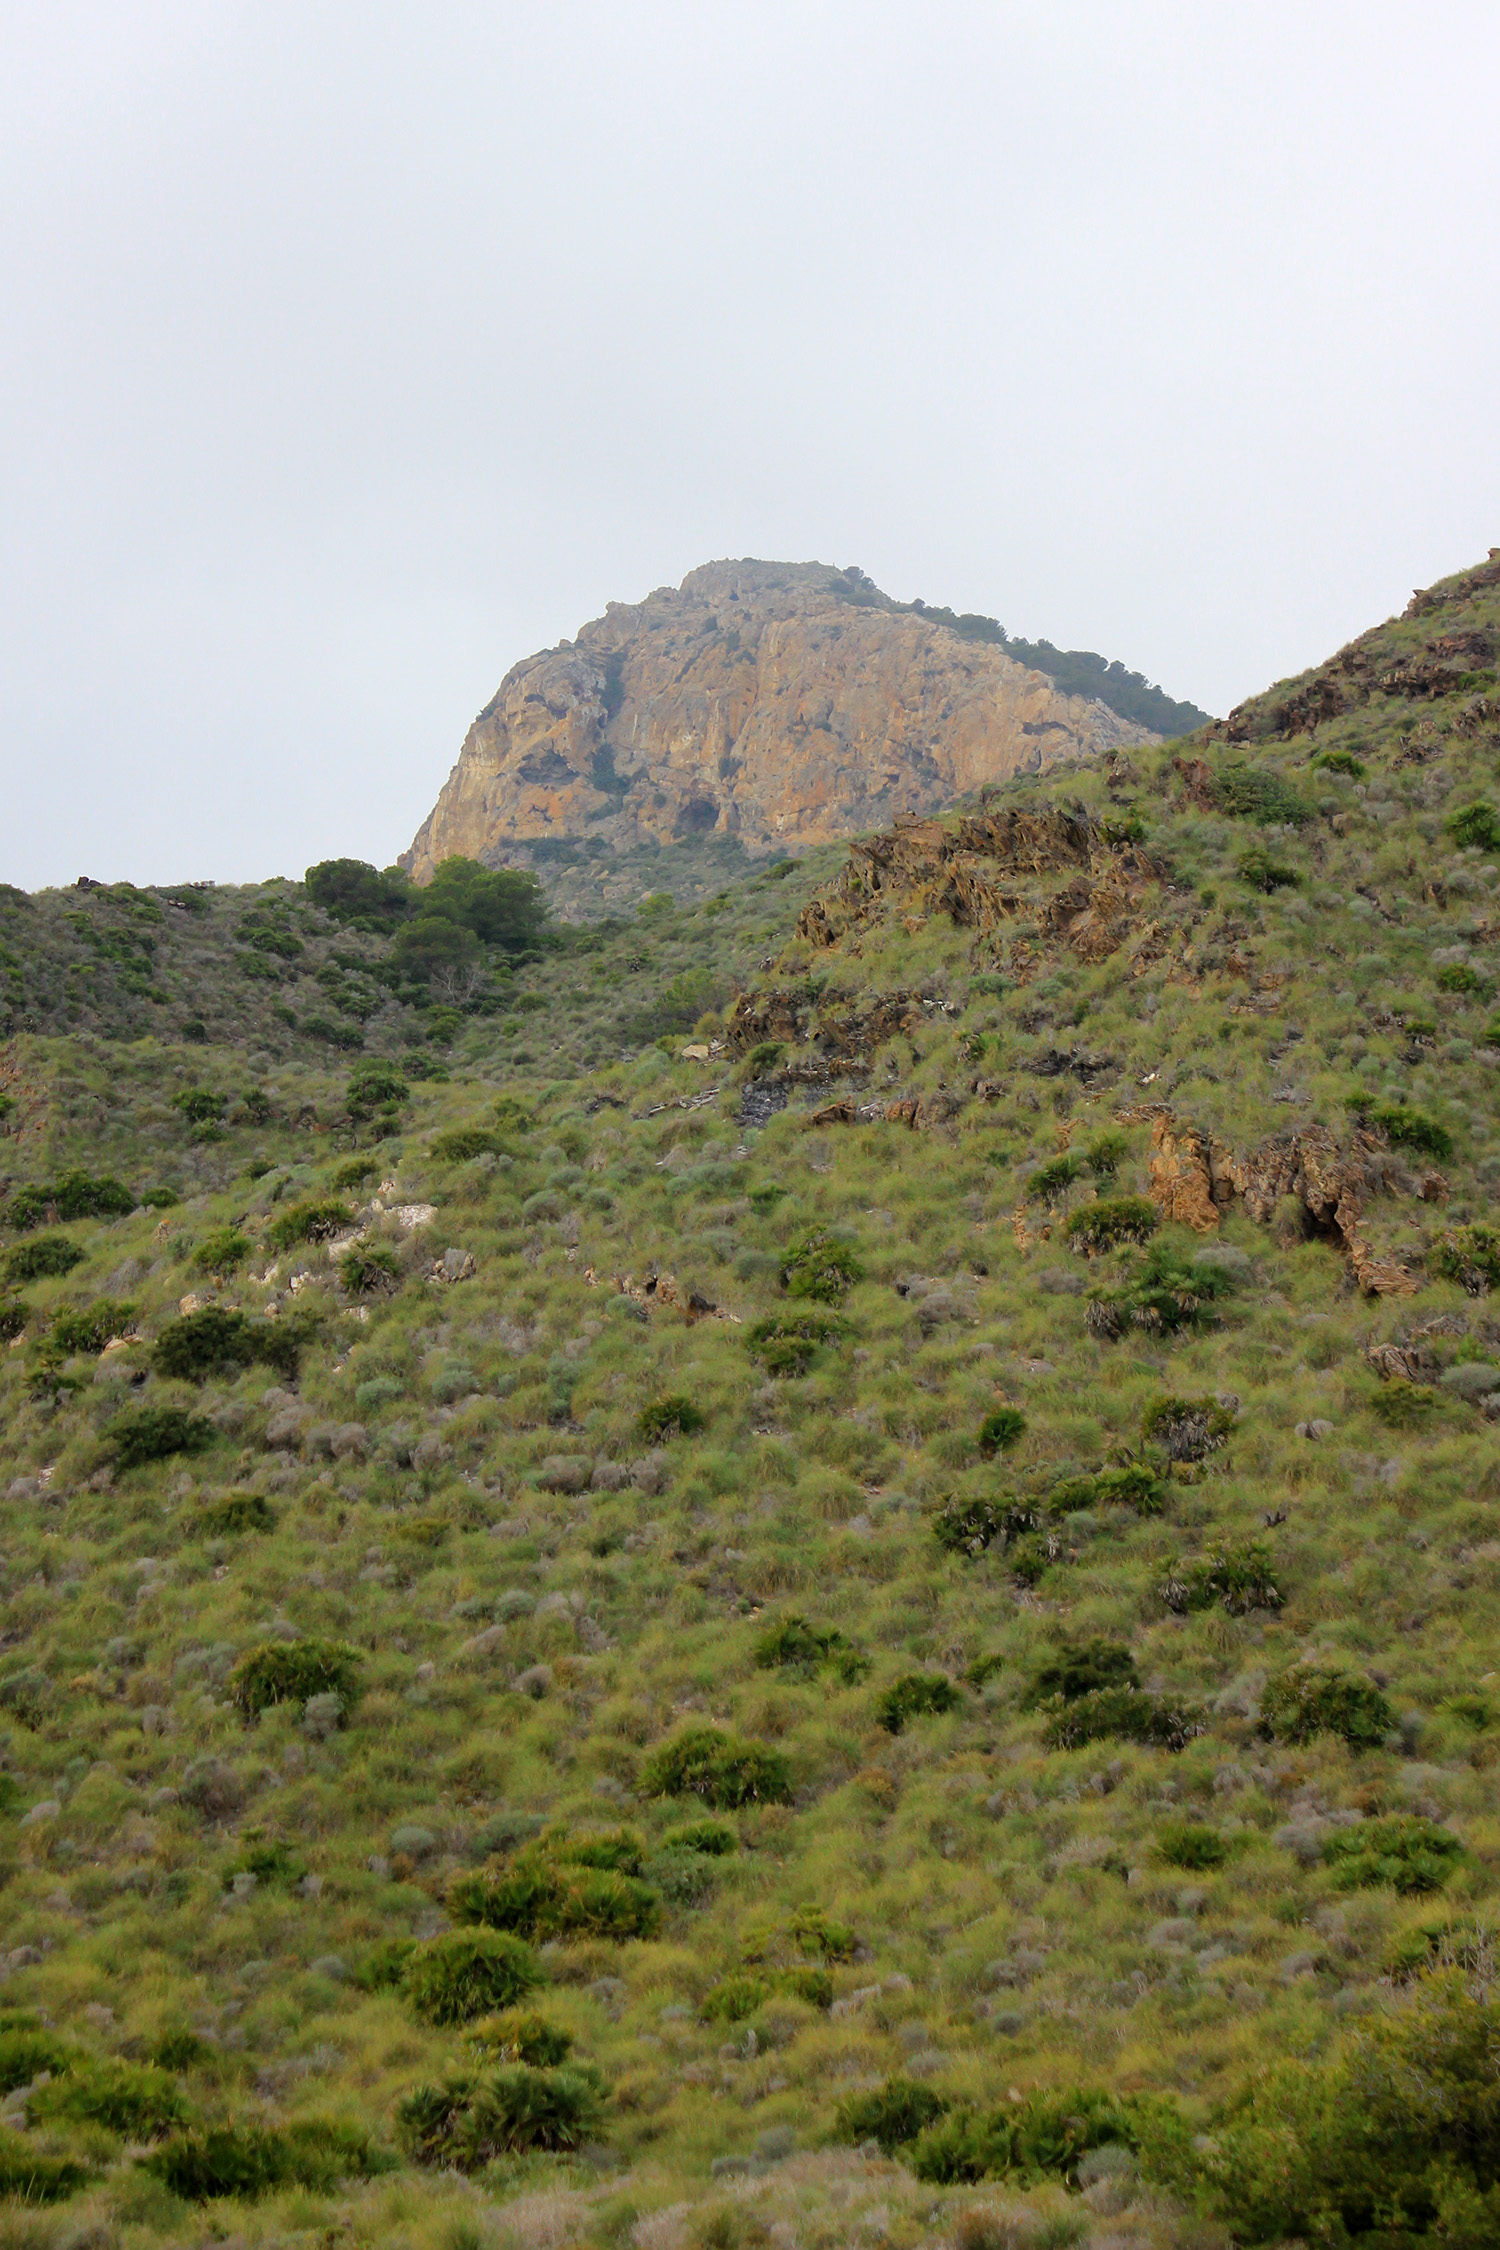 Parque Regional de Calblanque